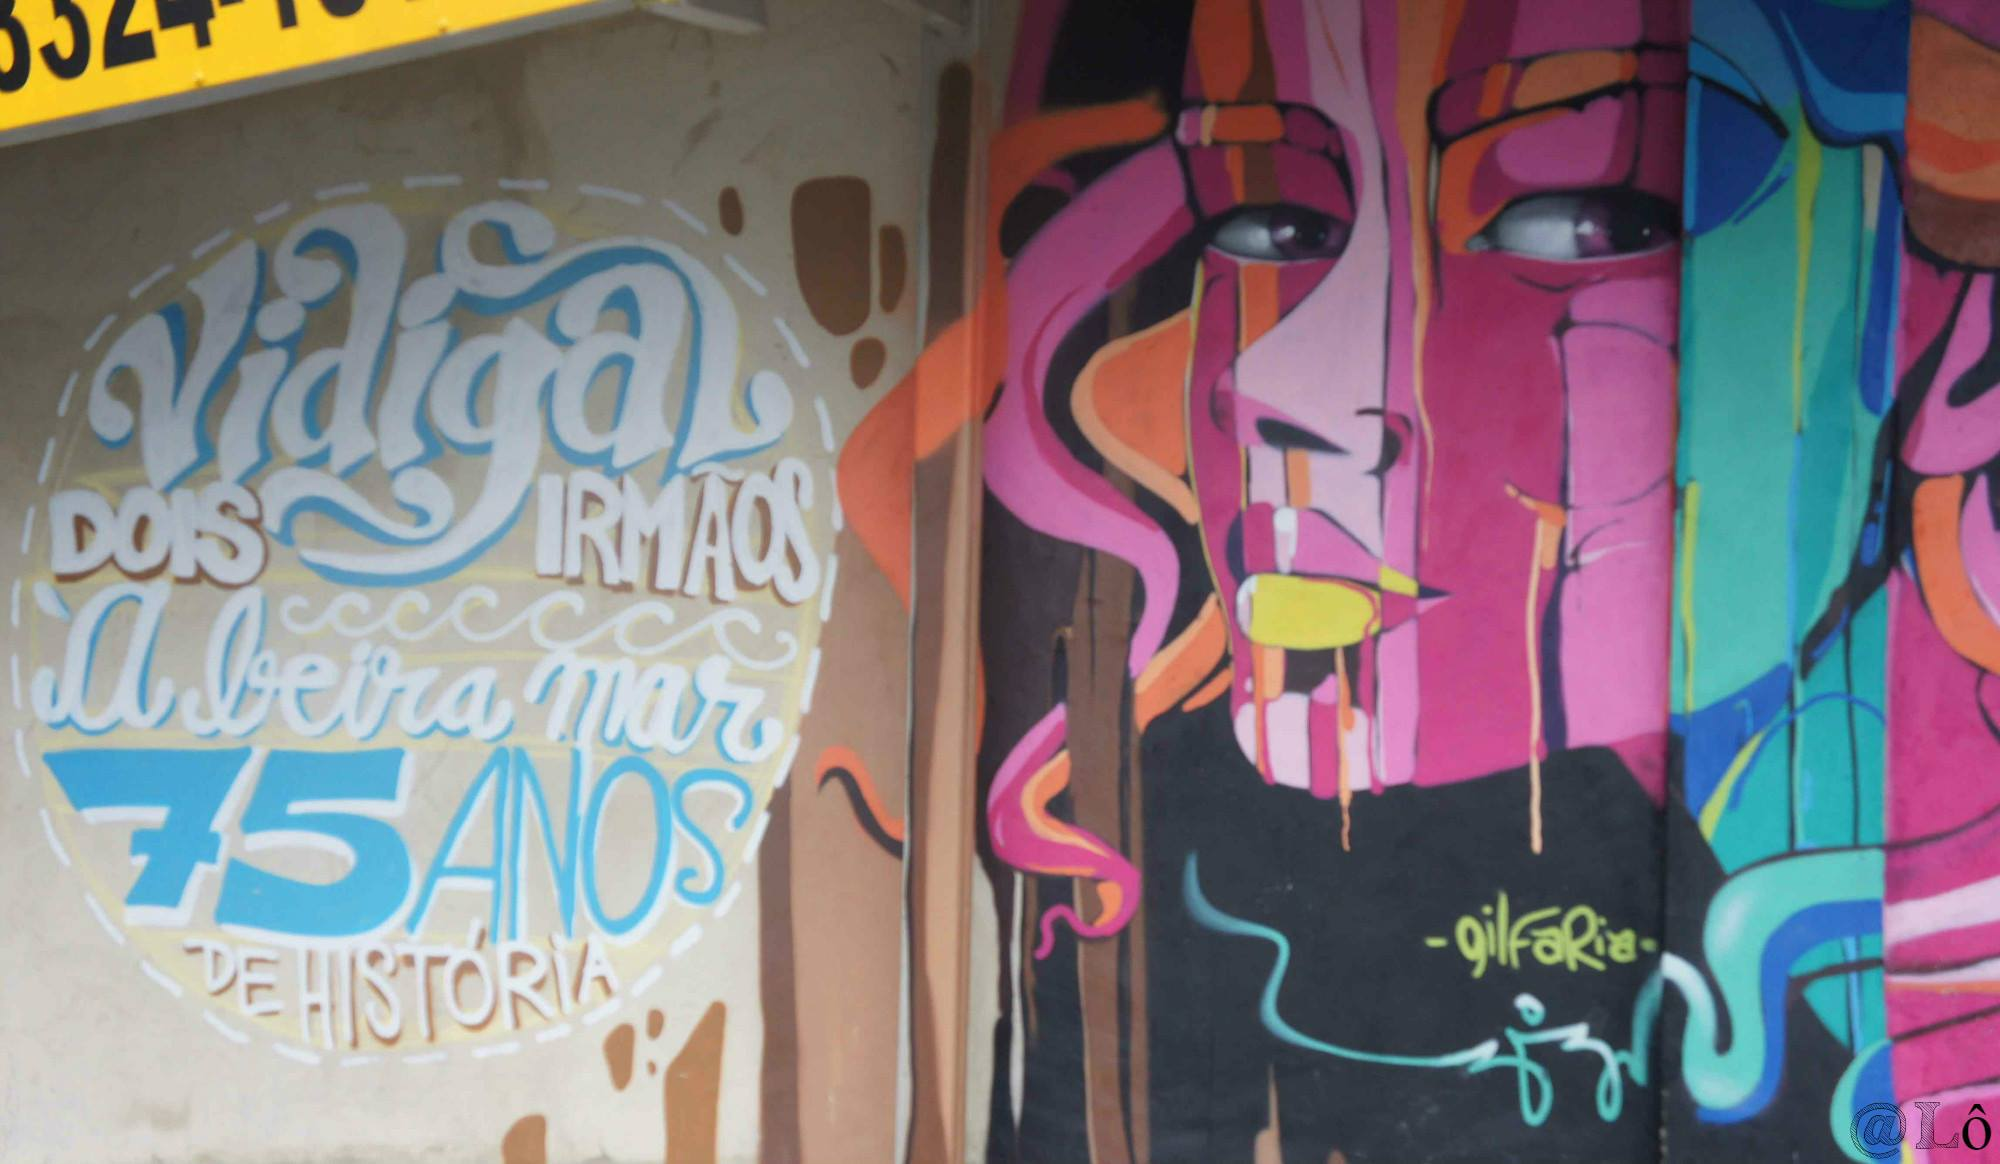 Galeria Viva na entrada do Vidigal. Lorraine Gaucher-Petitdemange